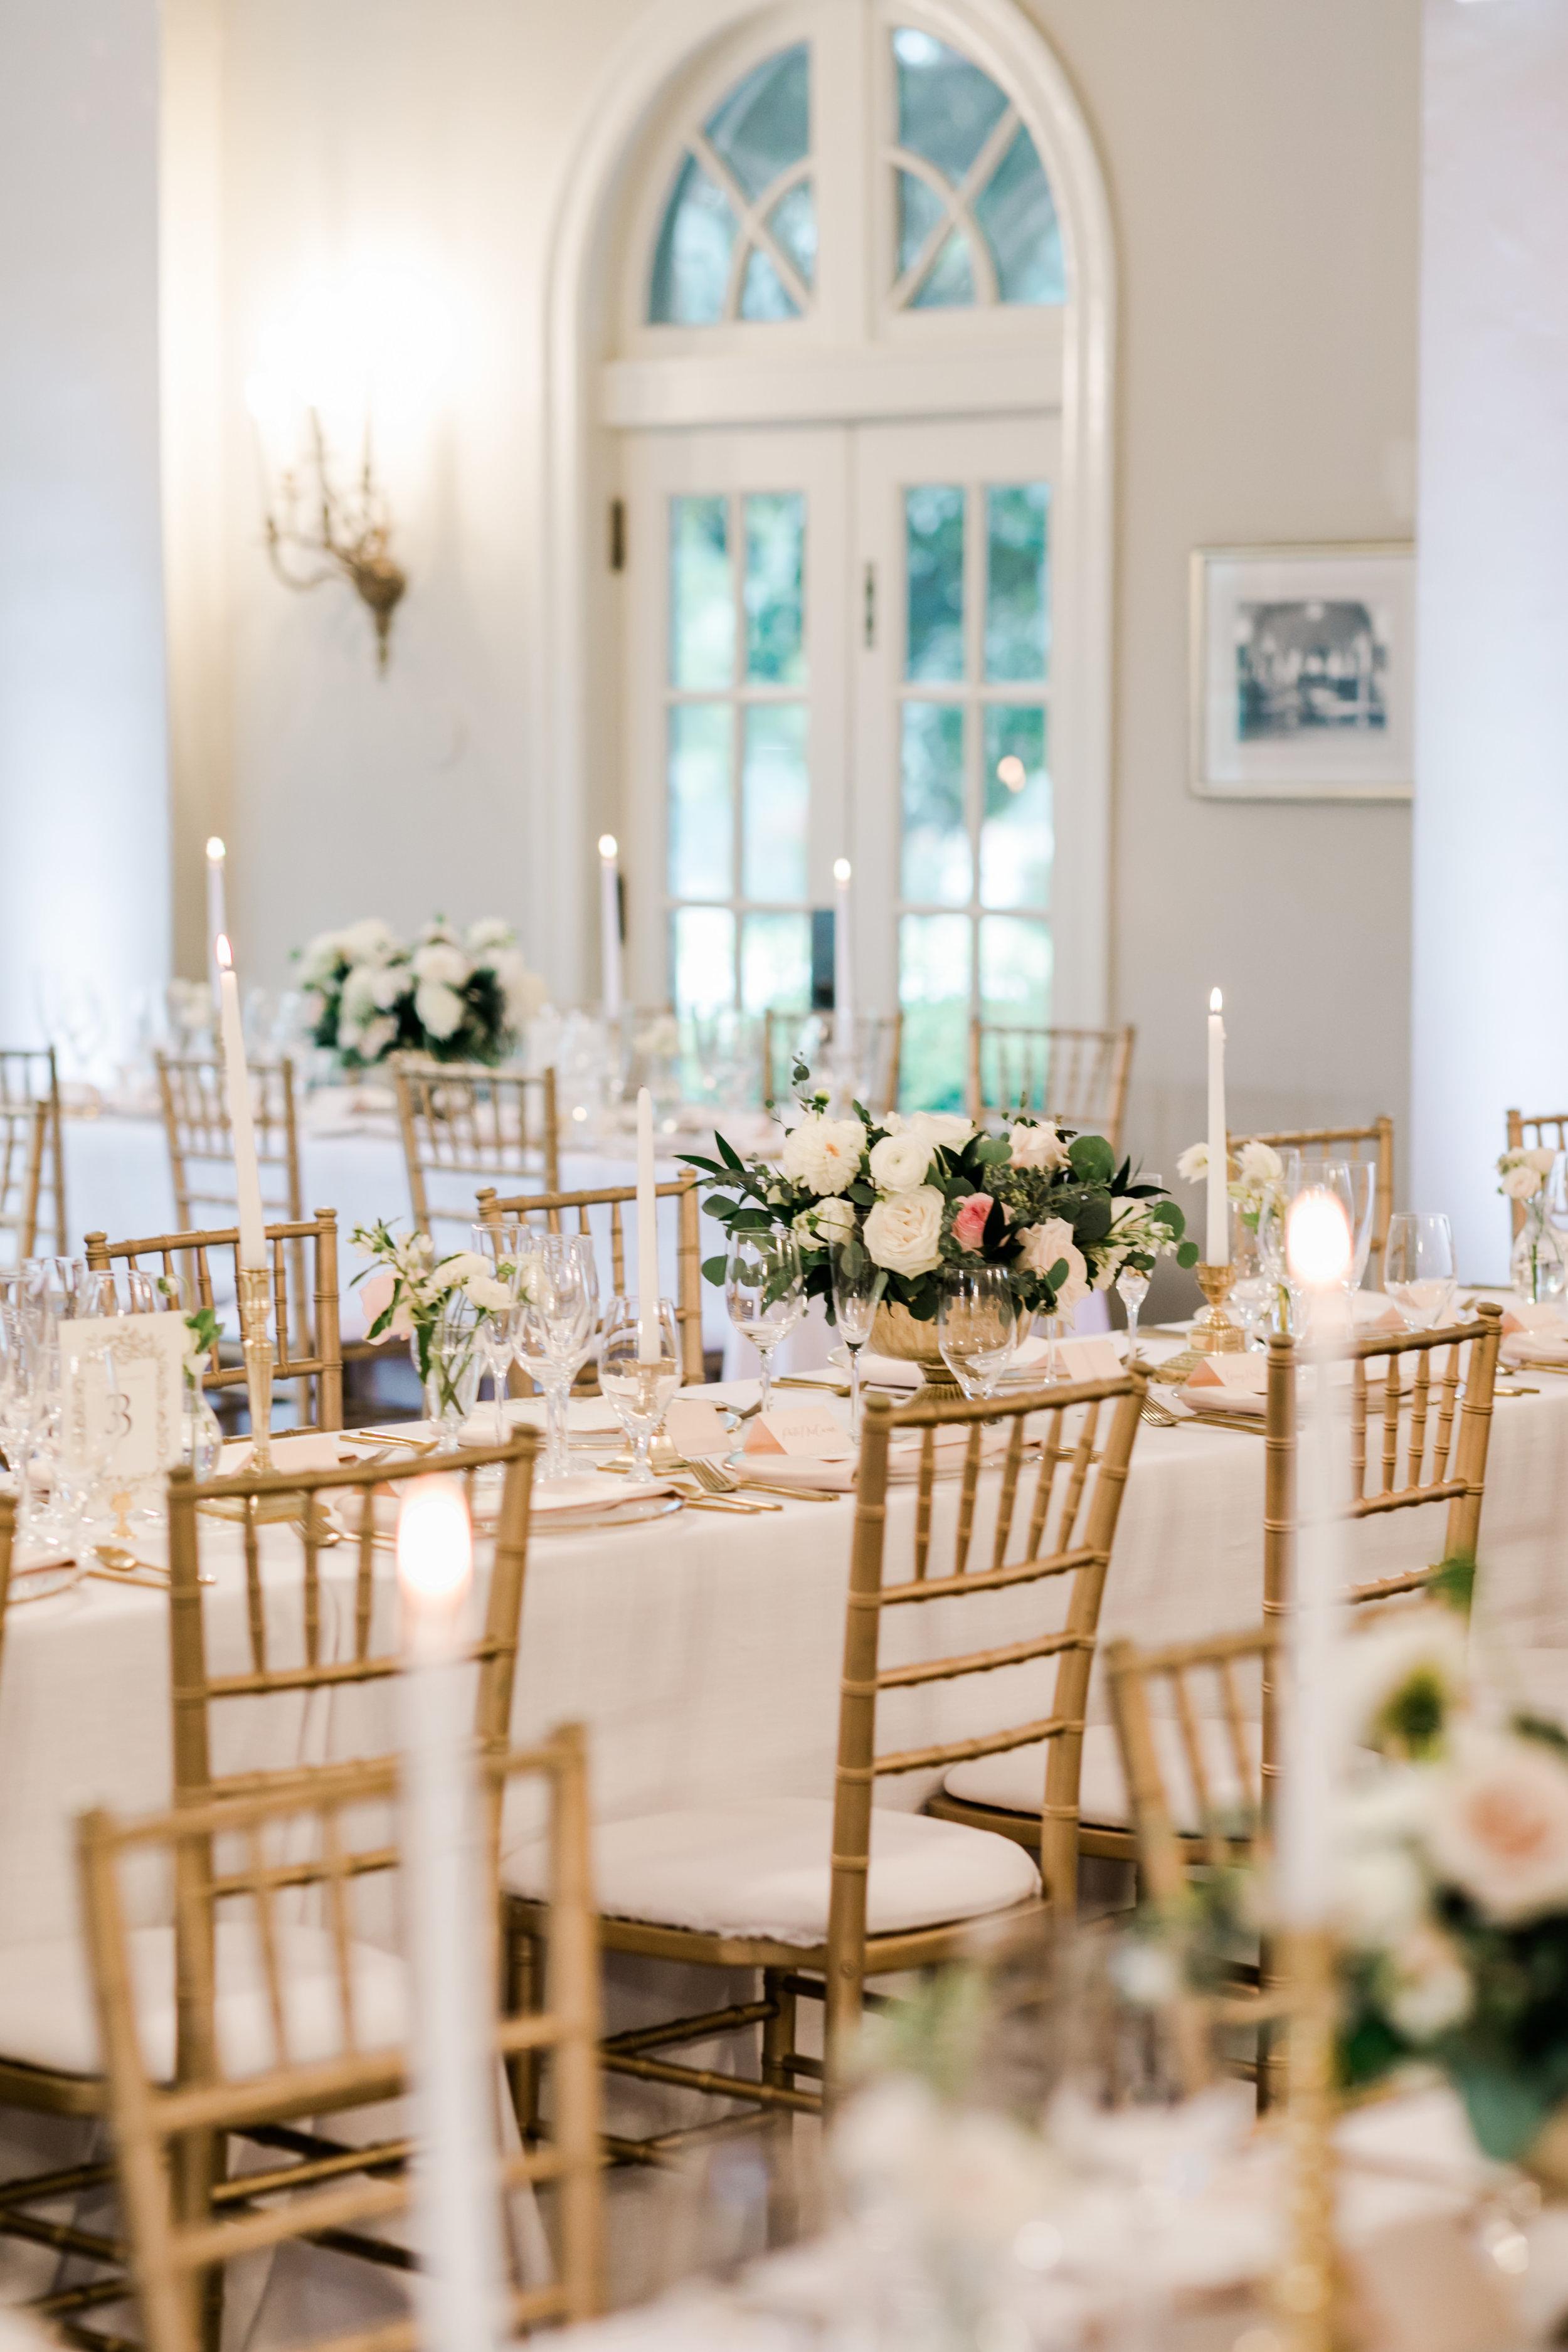 The Mansion at Woodward Park Tulsa Oklahoma Wedding_Valorie Darling Photography-9944-2.jpg